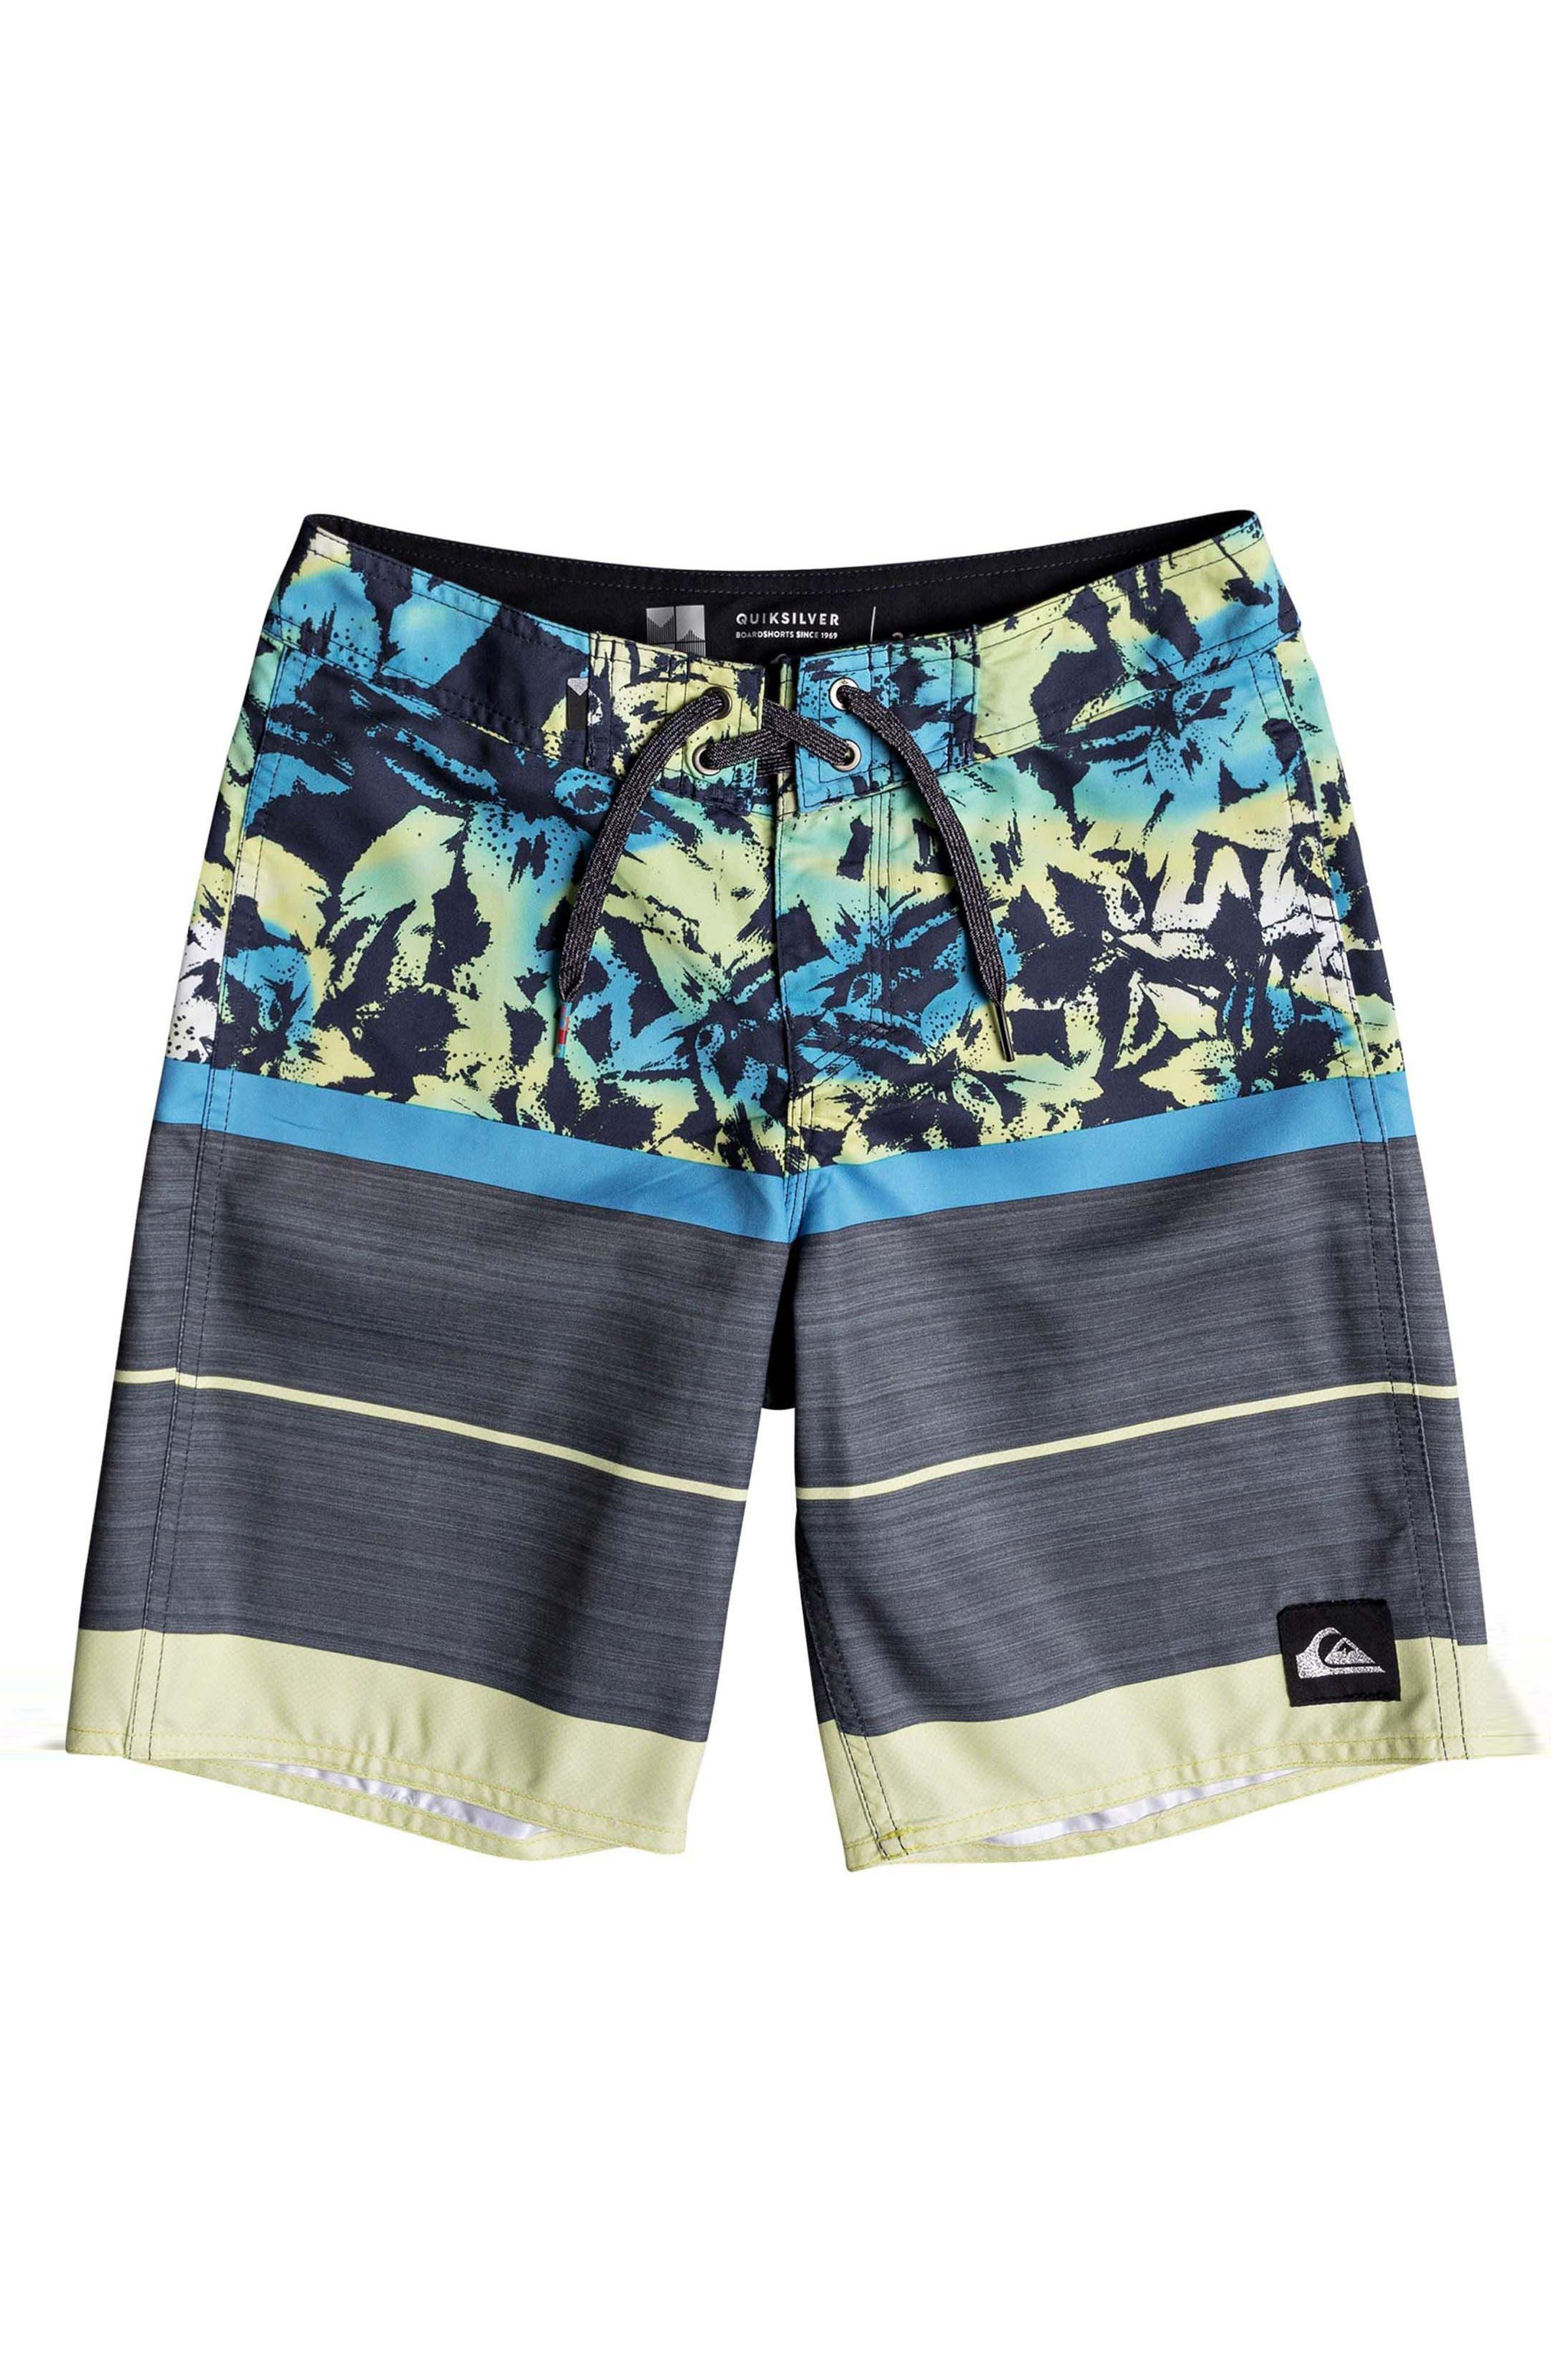 Slab Island Board Shorts,                         Main,                         color, Cyan Blue